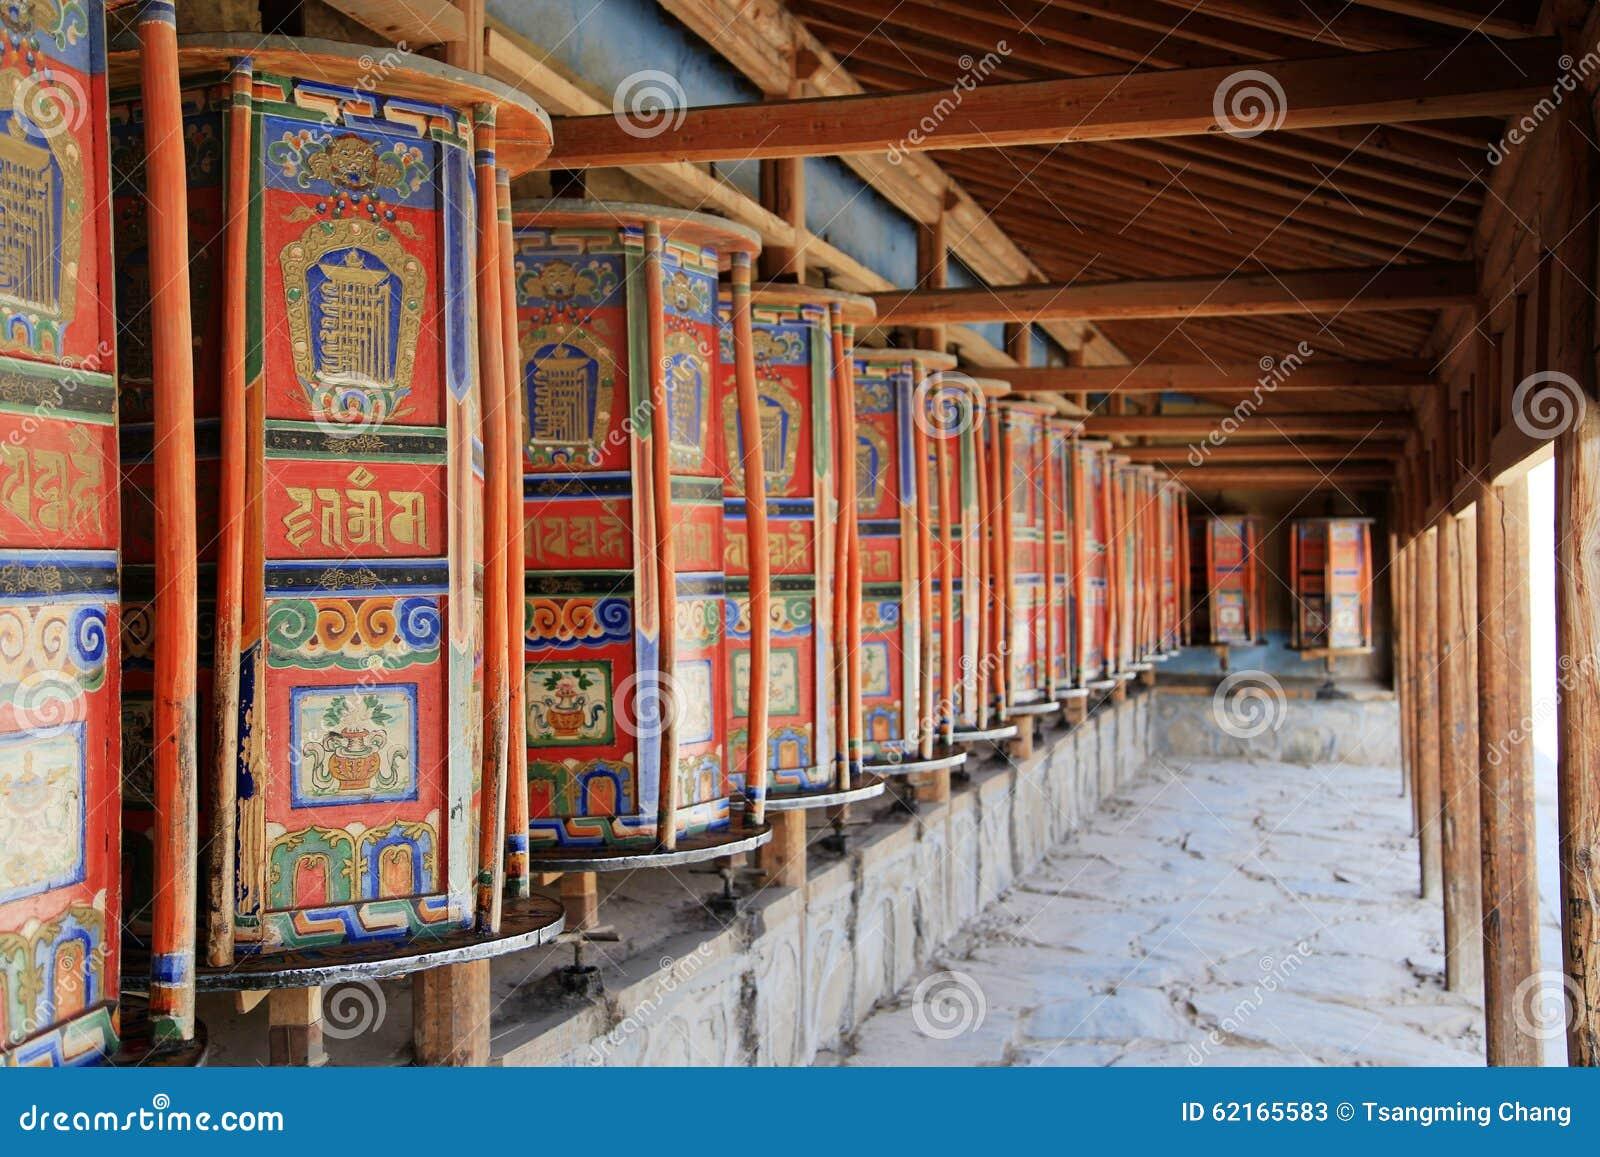 Lamasery Labrang тибетского буддизма в Китае